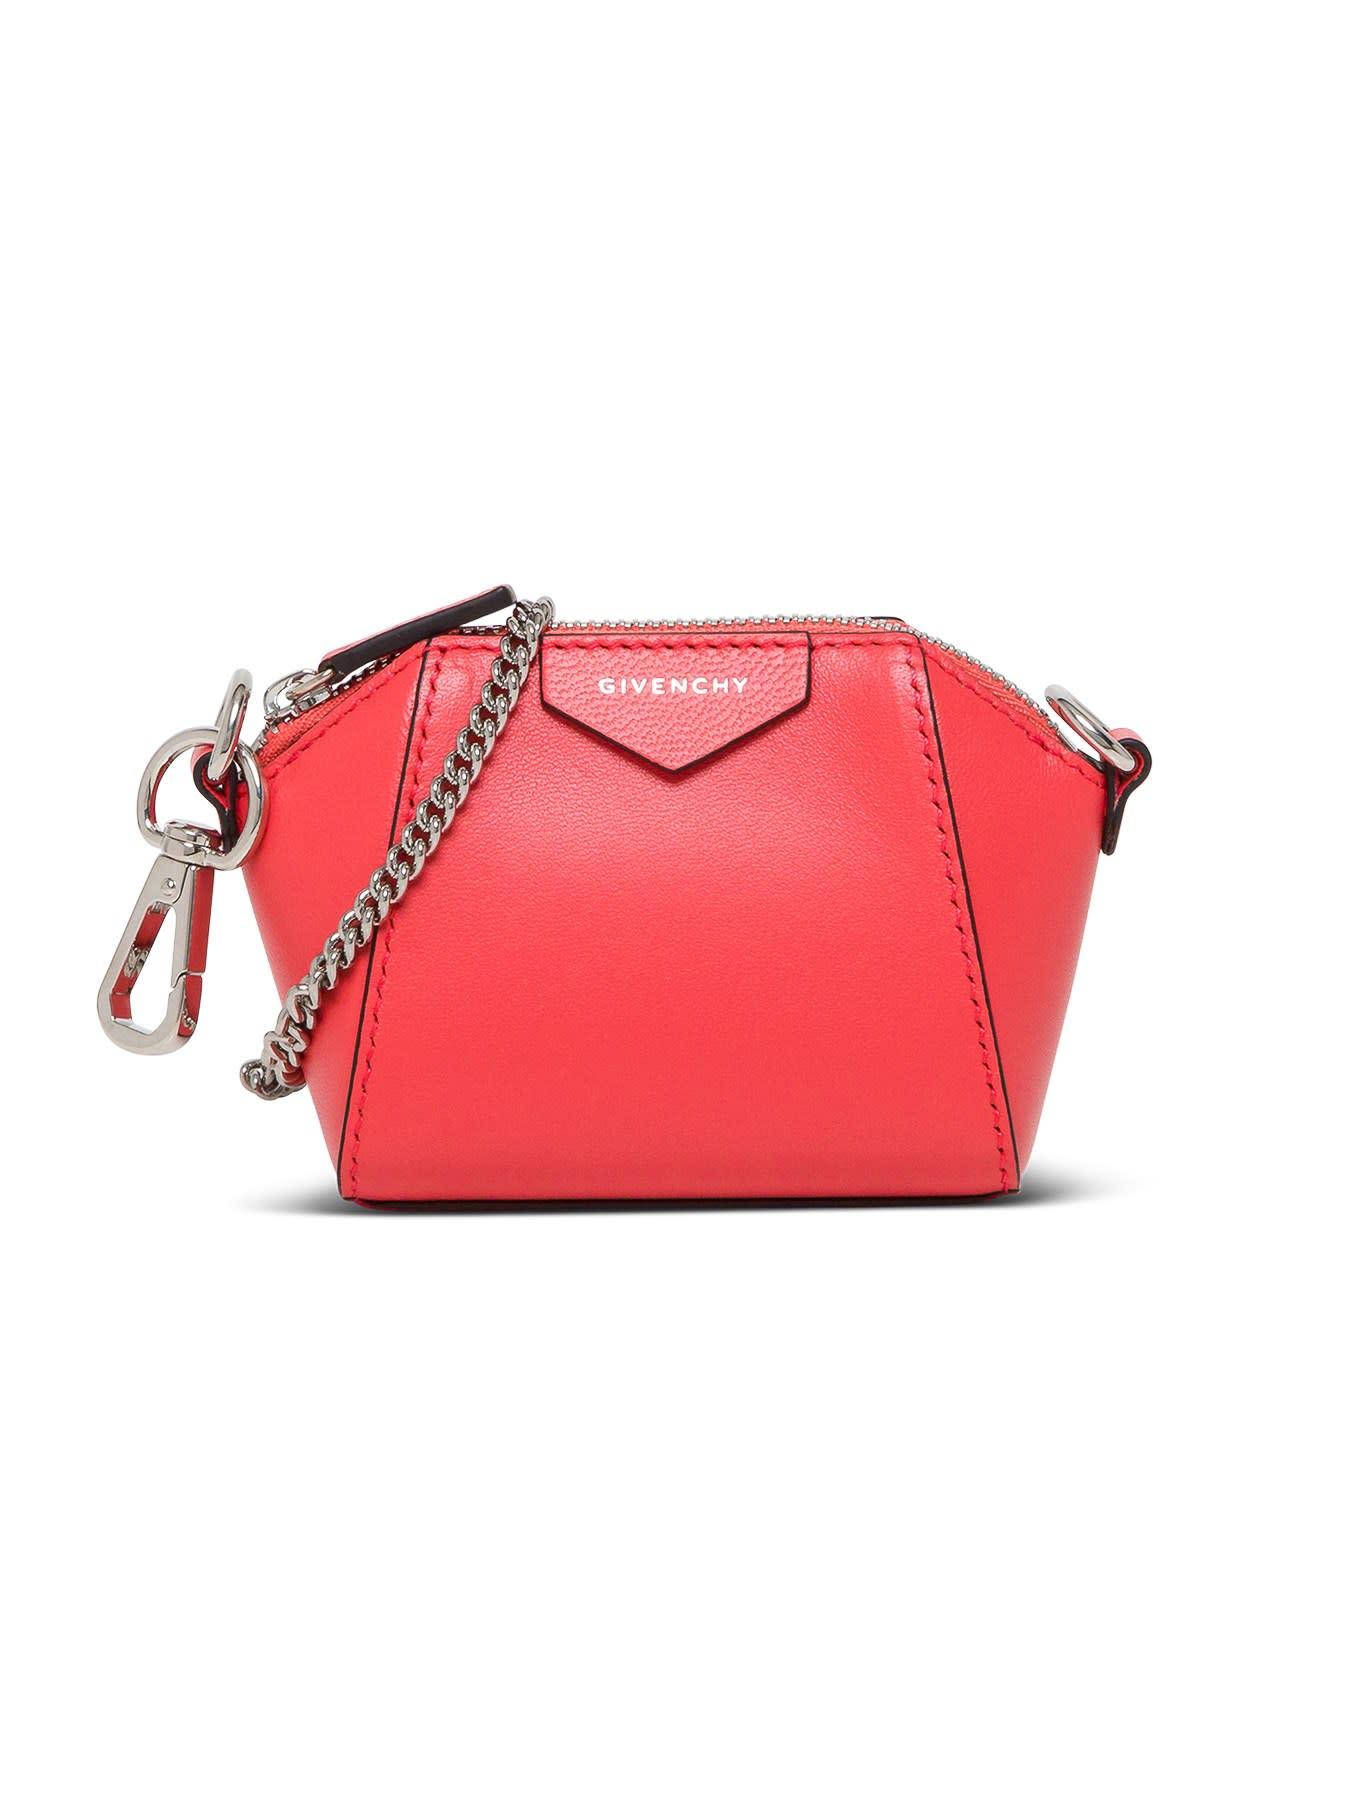 Givenchy Antigona Nano Crossbody Bag